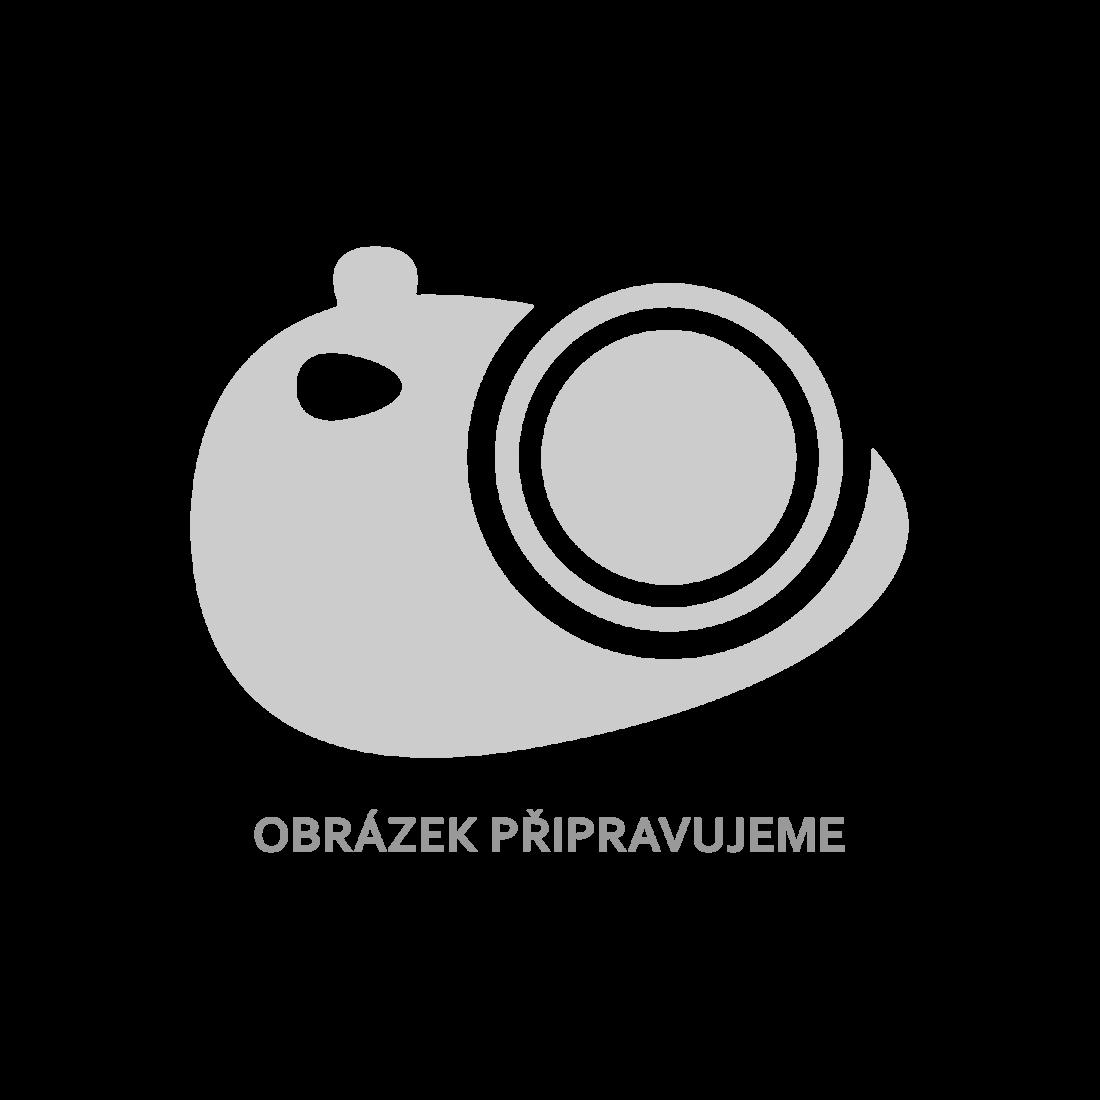 Plachta proti slunci, HDPE, trojúhelník, 3,6 x 3,6 x 3,6 m, béžová